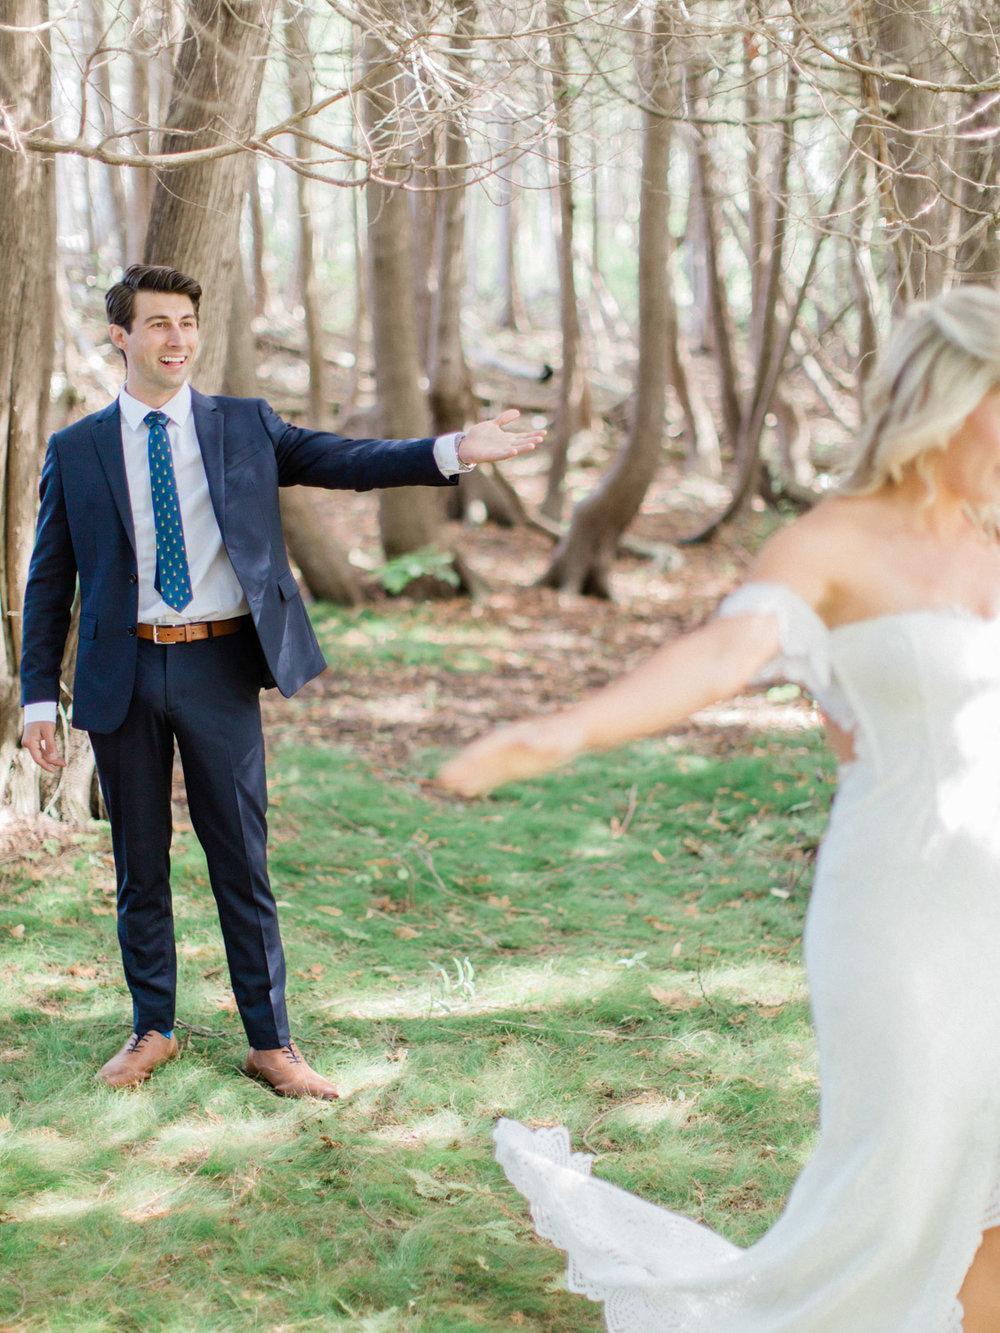 Toronto-Collingwood-Muskoka-Wedding-photographer-planning-first-look3.jpg